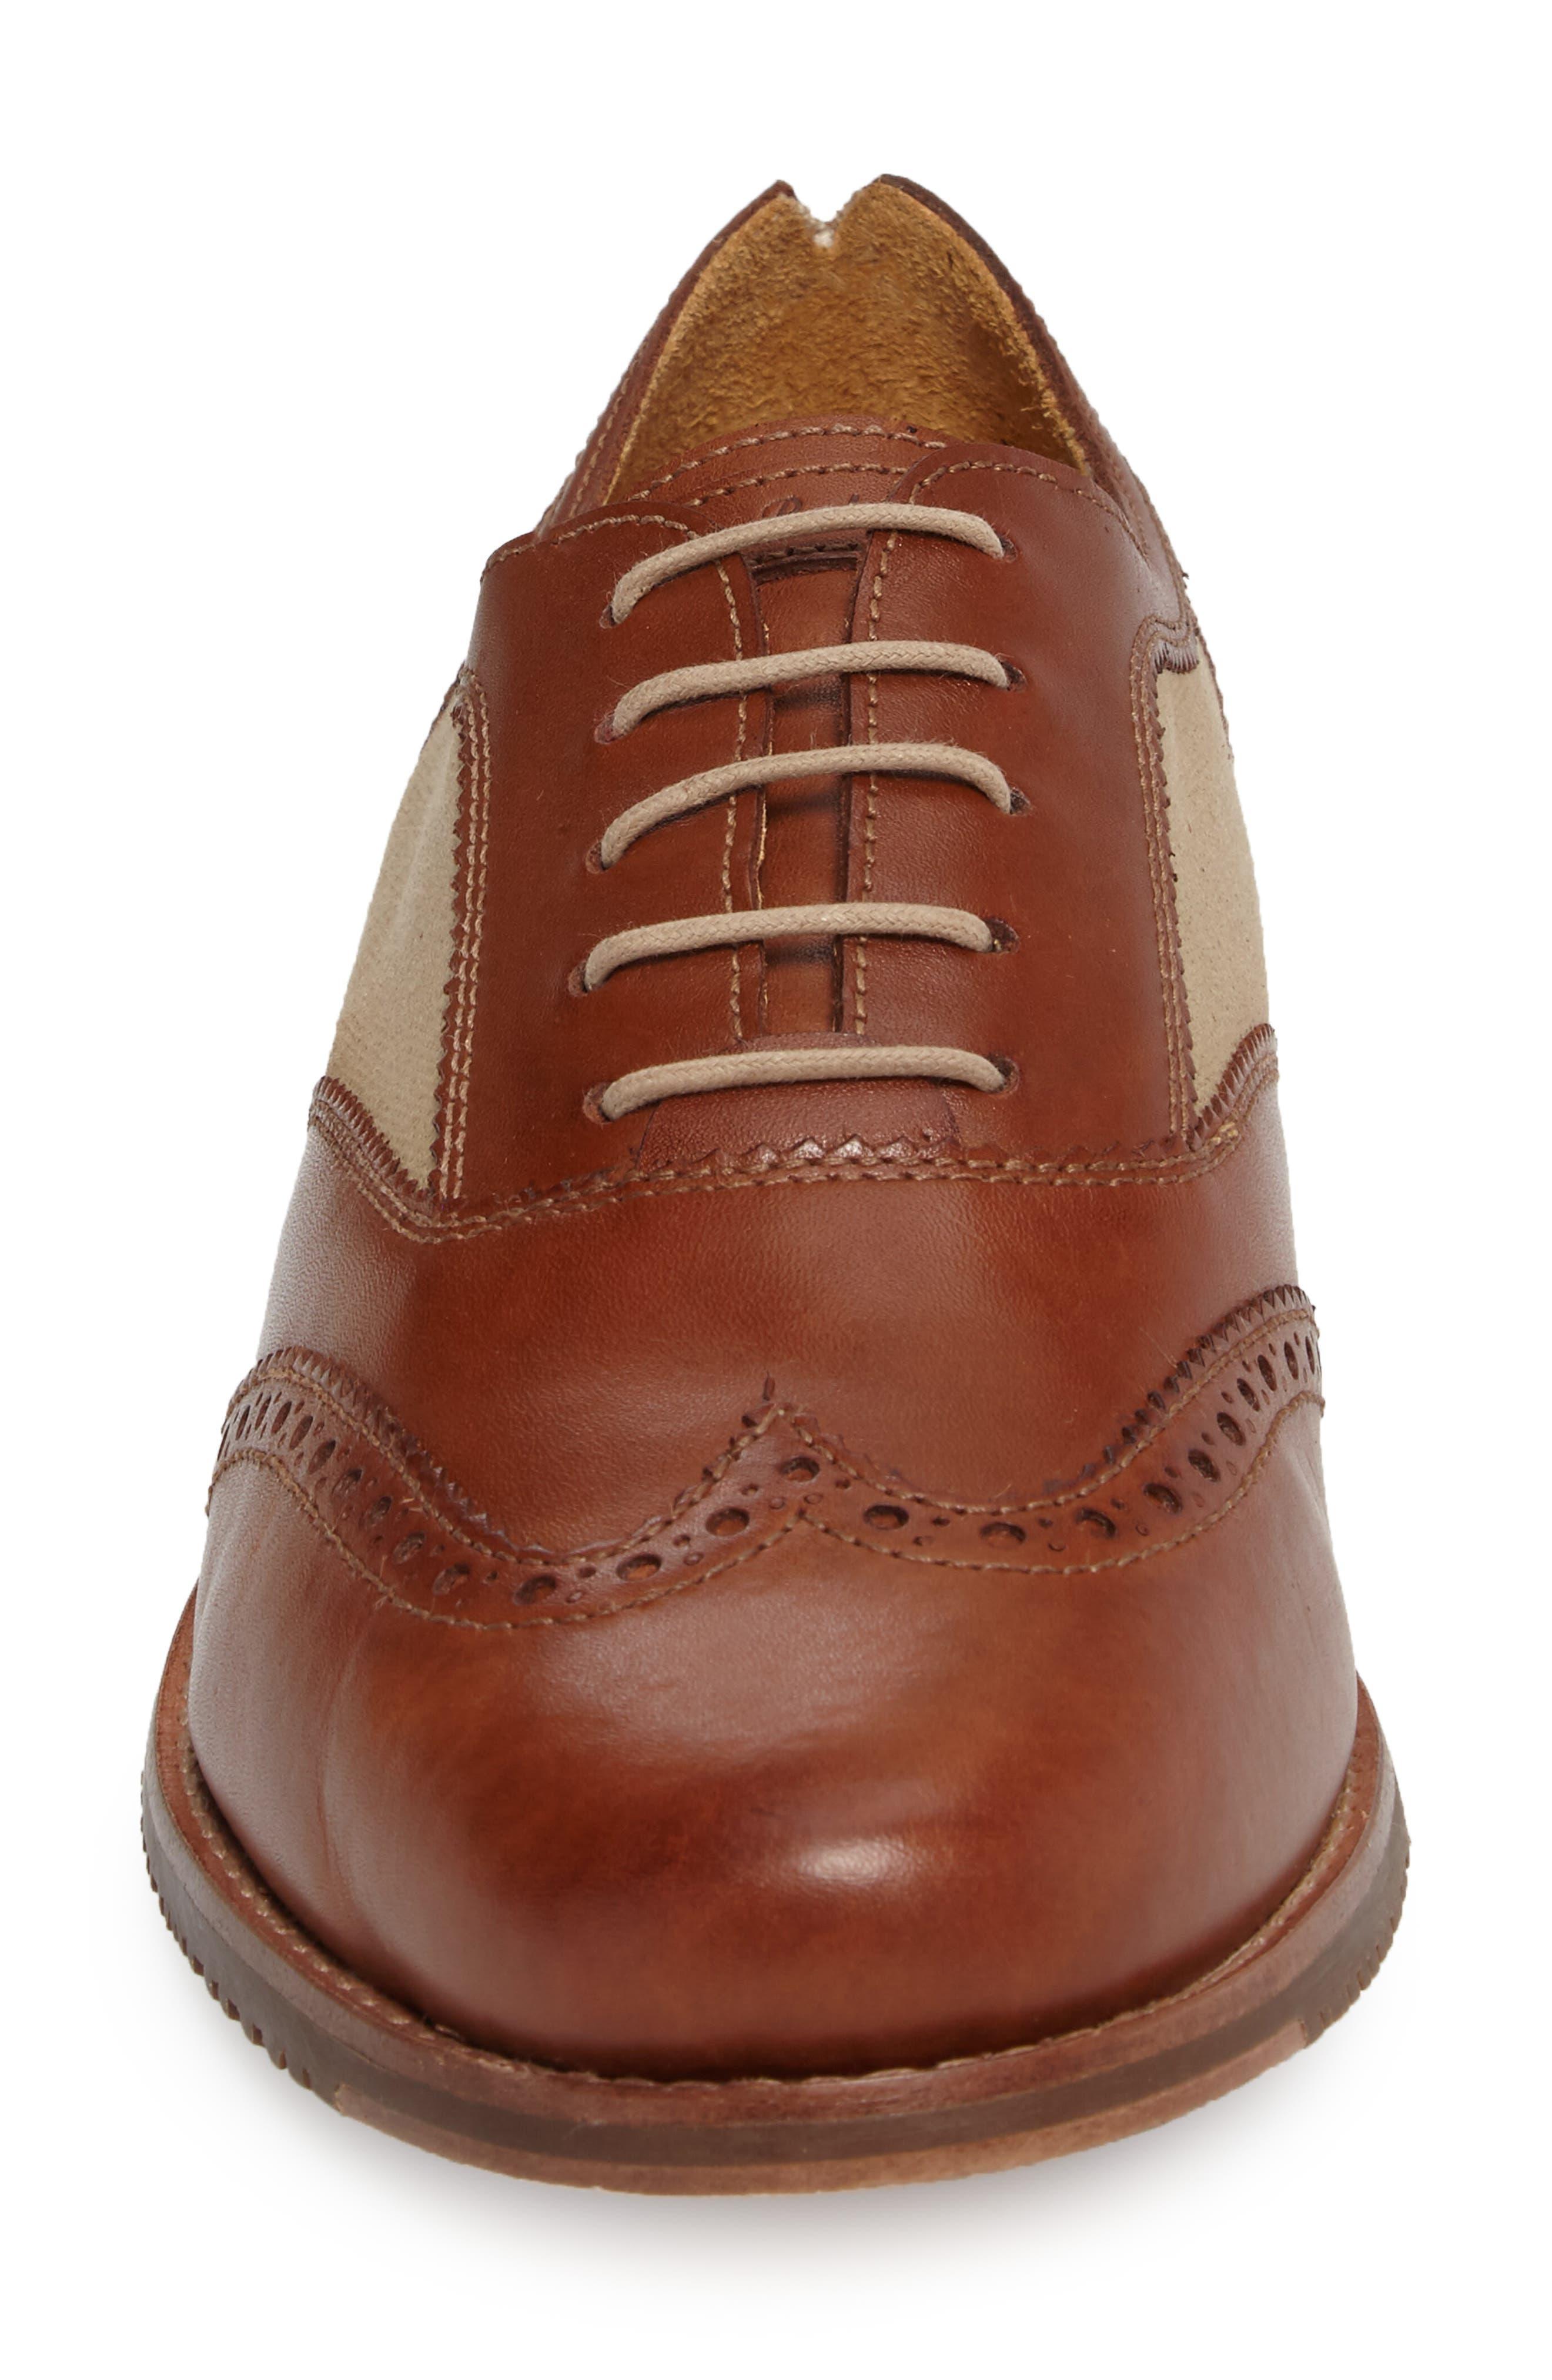 Felman Wingtip,                             Alternate thumbnail 4, color,                             Whiskey Leather